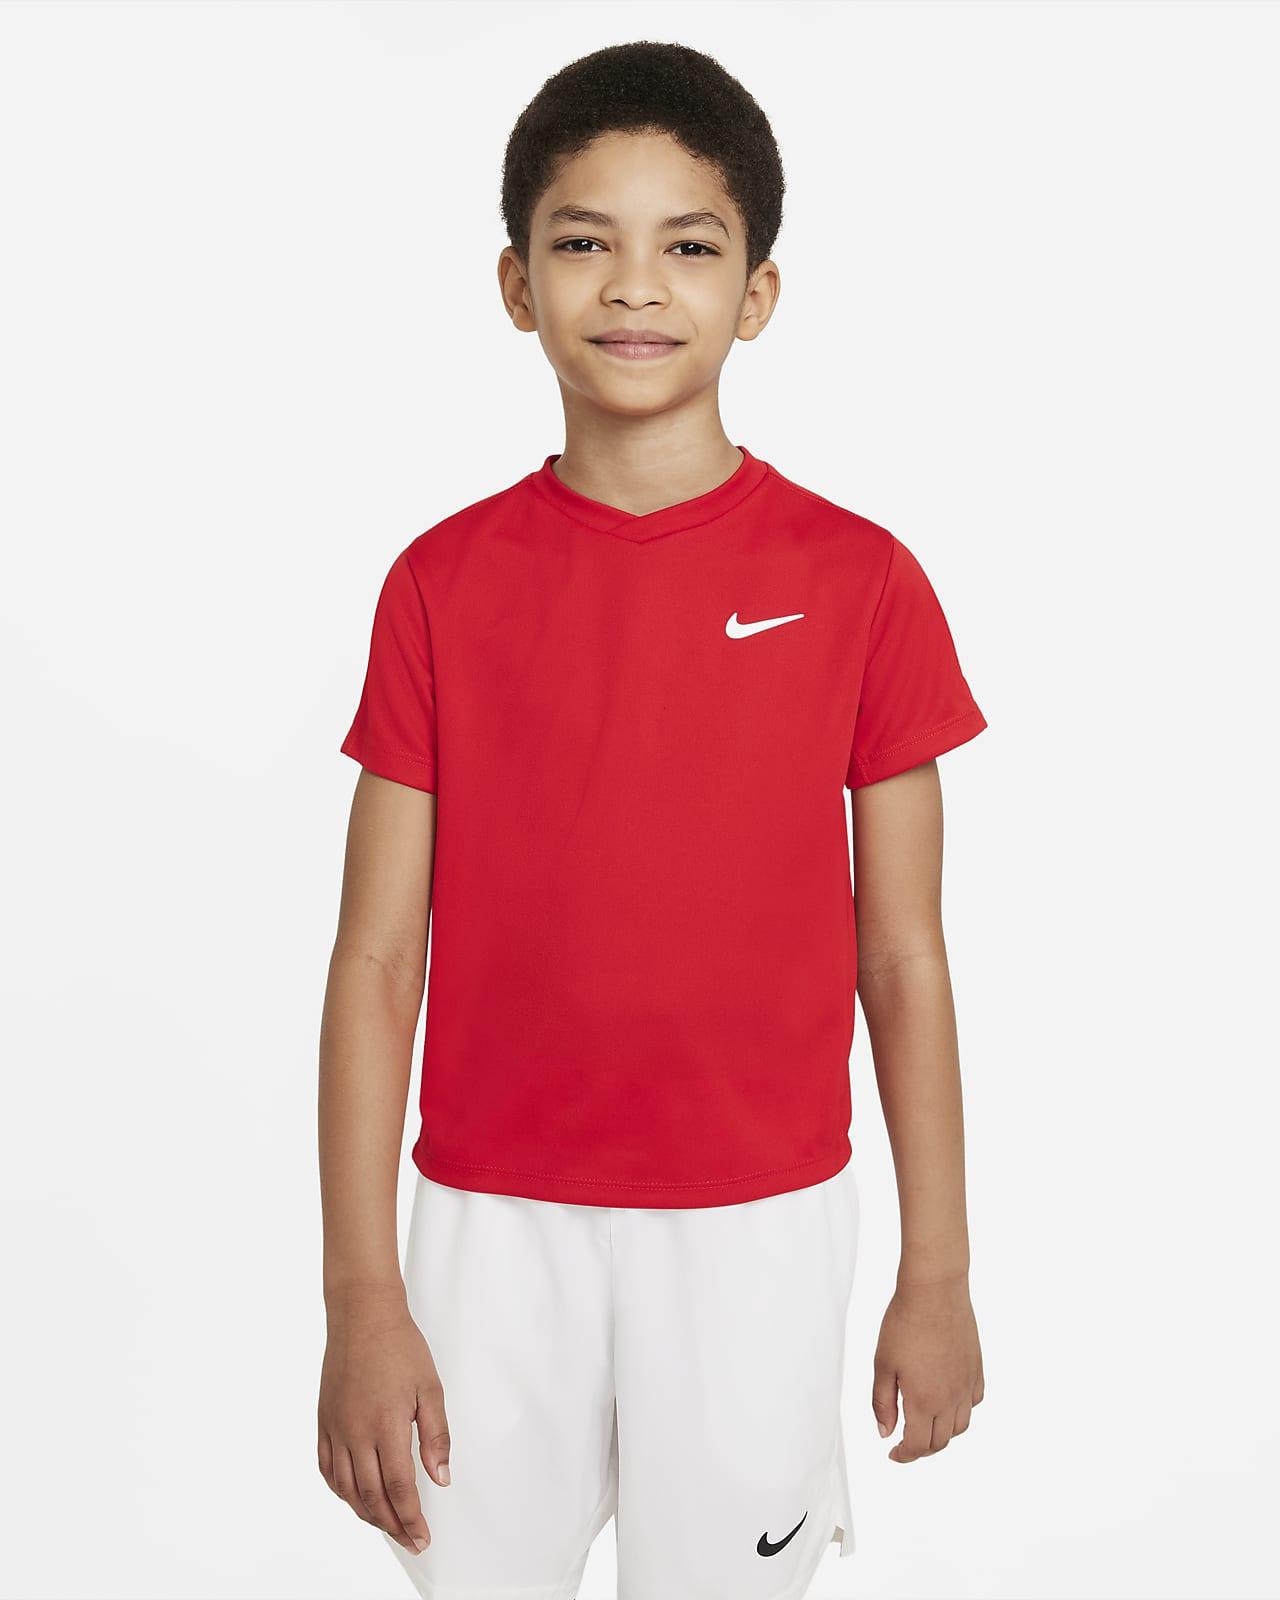 Prenda para la parte superior de tenis de manga corta para niño talla grande NikeCourt Dri-FIT Victory